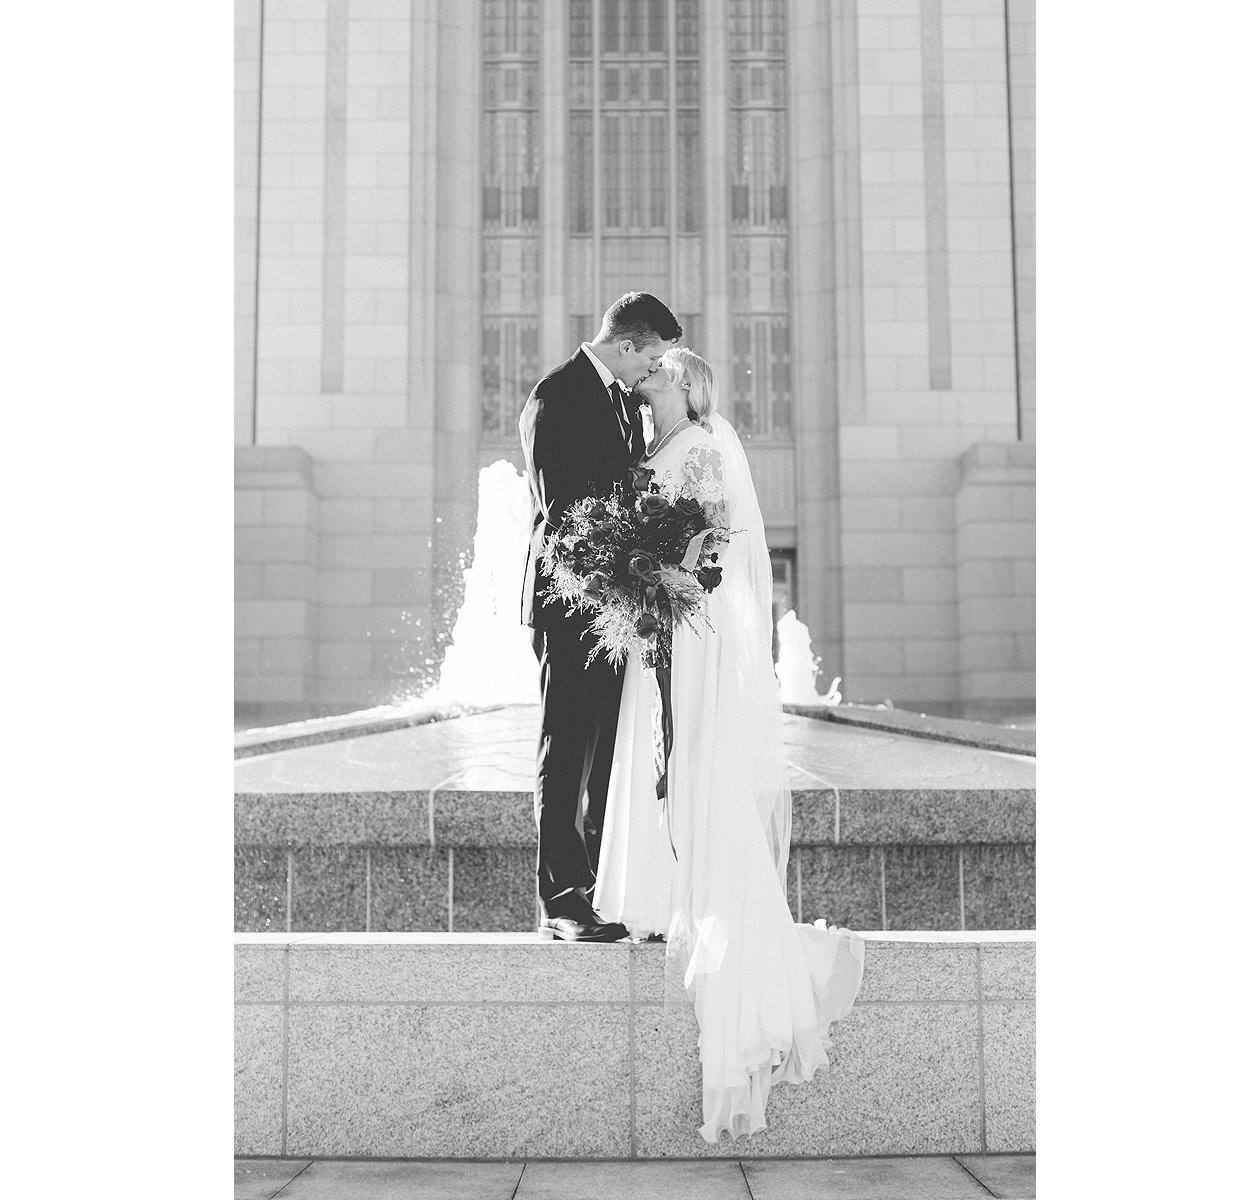 LoganUtahWeddingPhotography-HeidiRandallStudios-Kelsey-Jackson-32.jpg